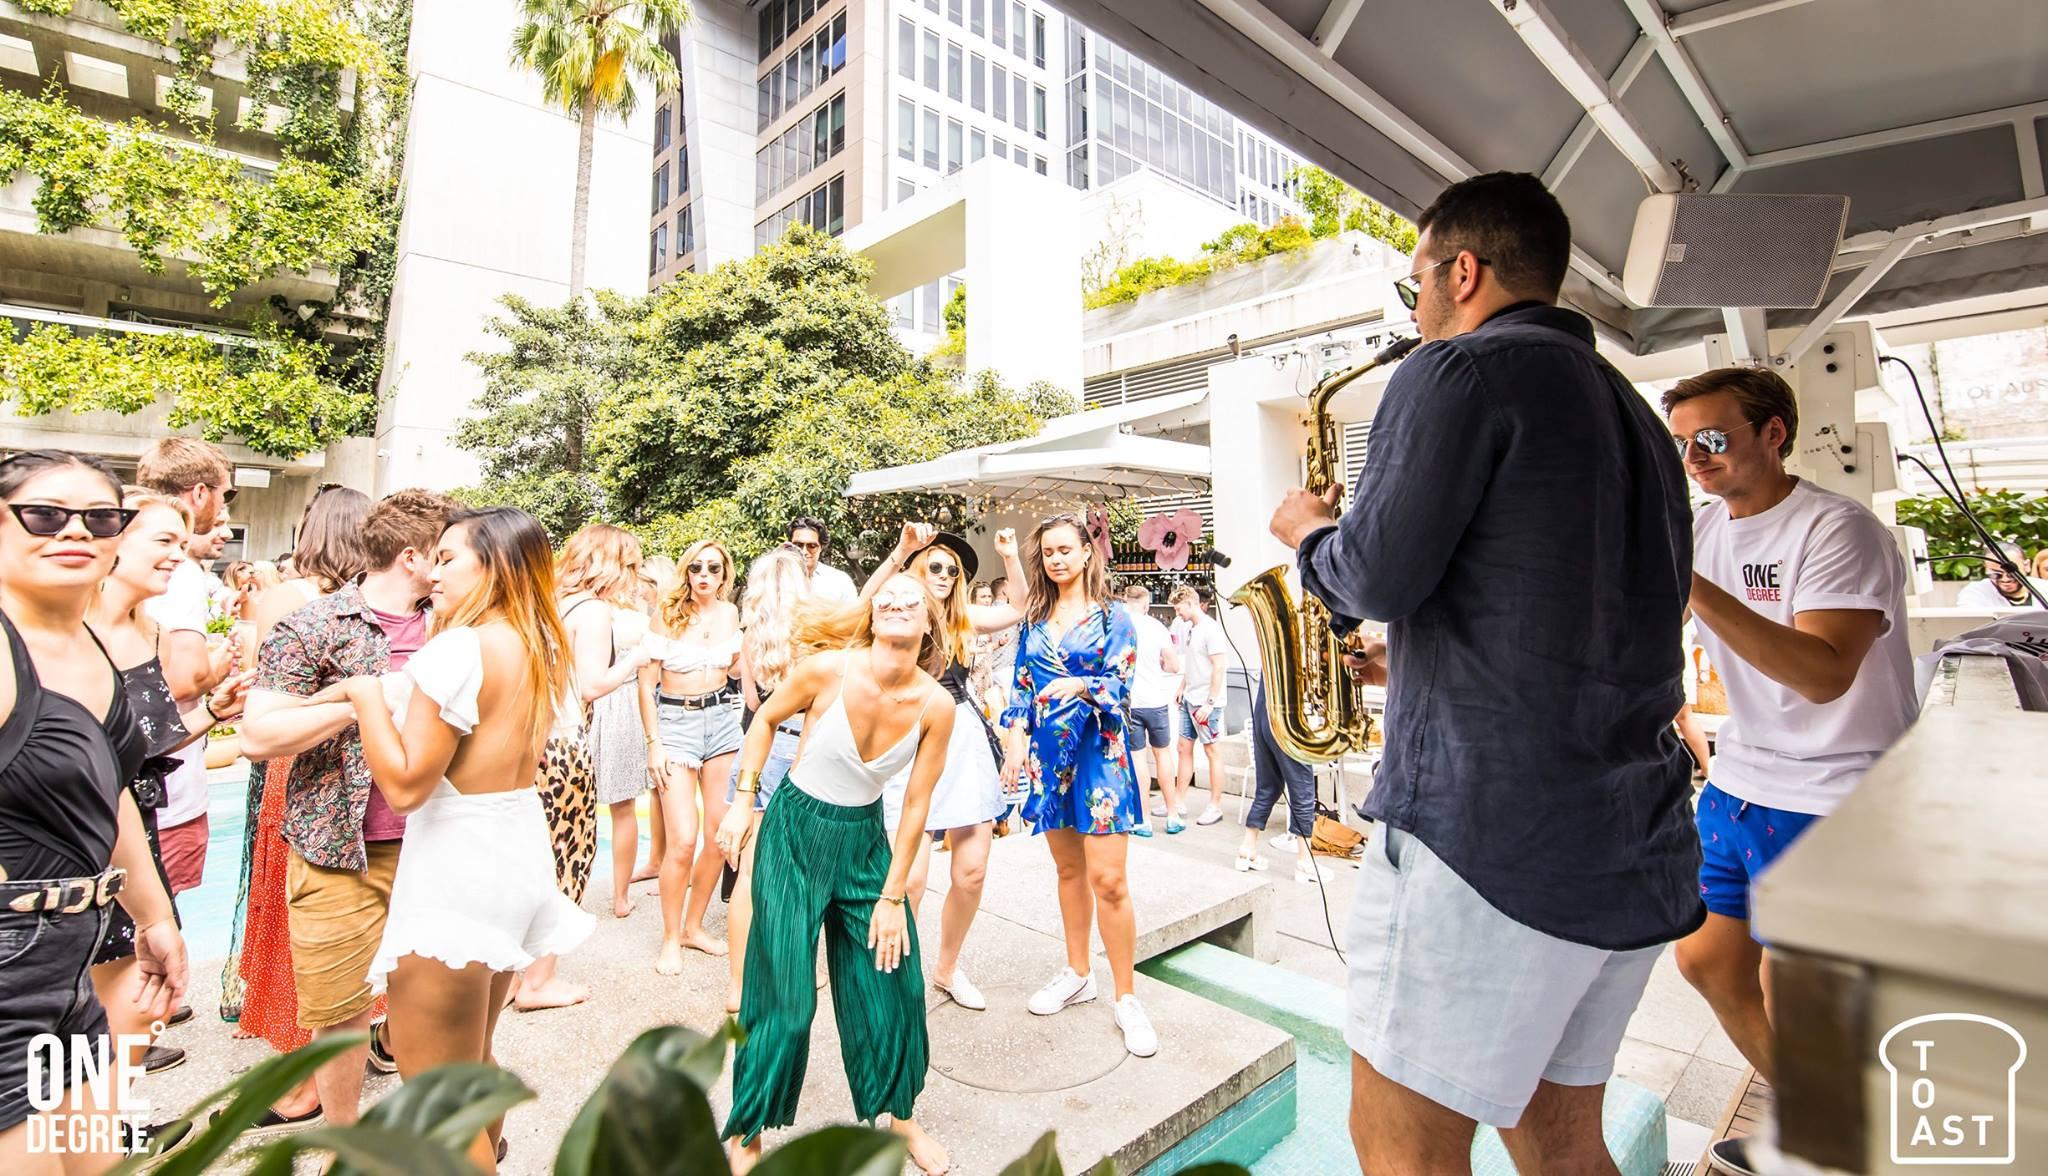 DJ Sax Clubs Events Weddings